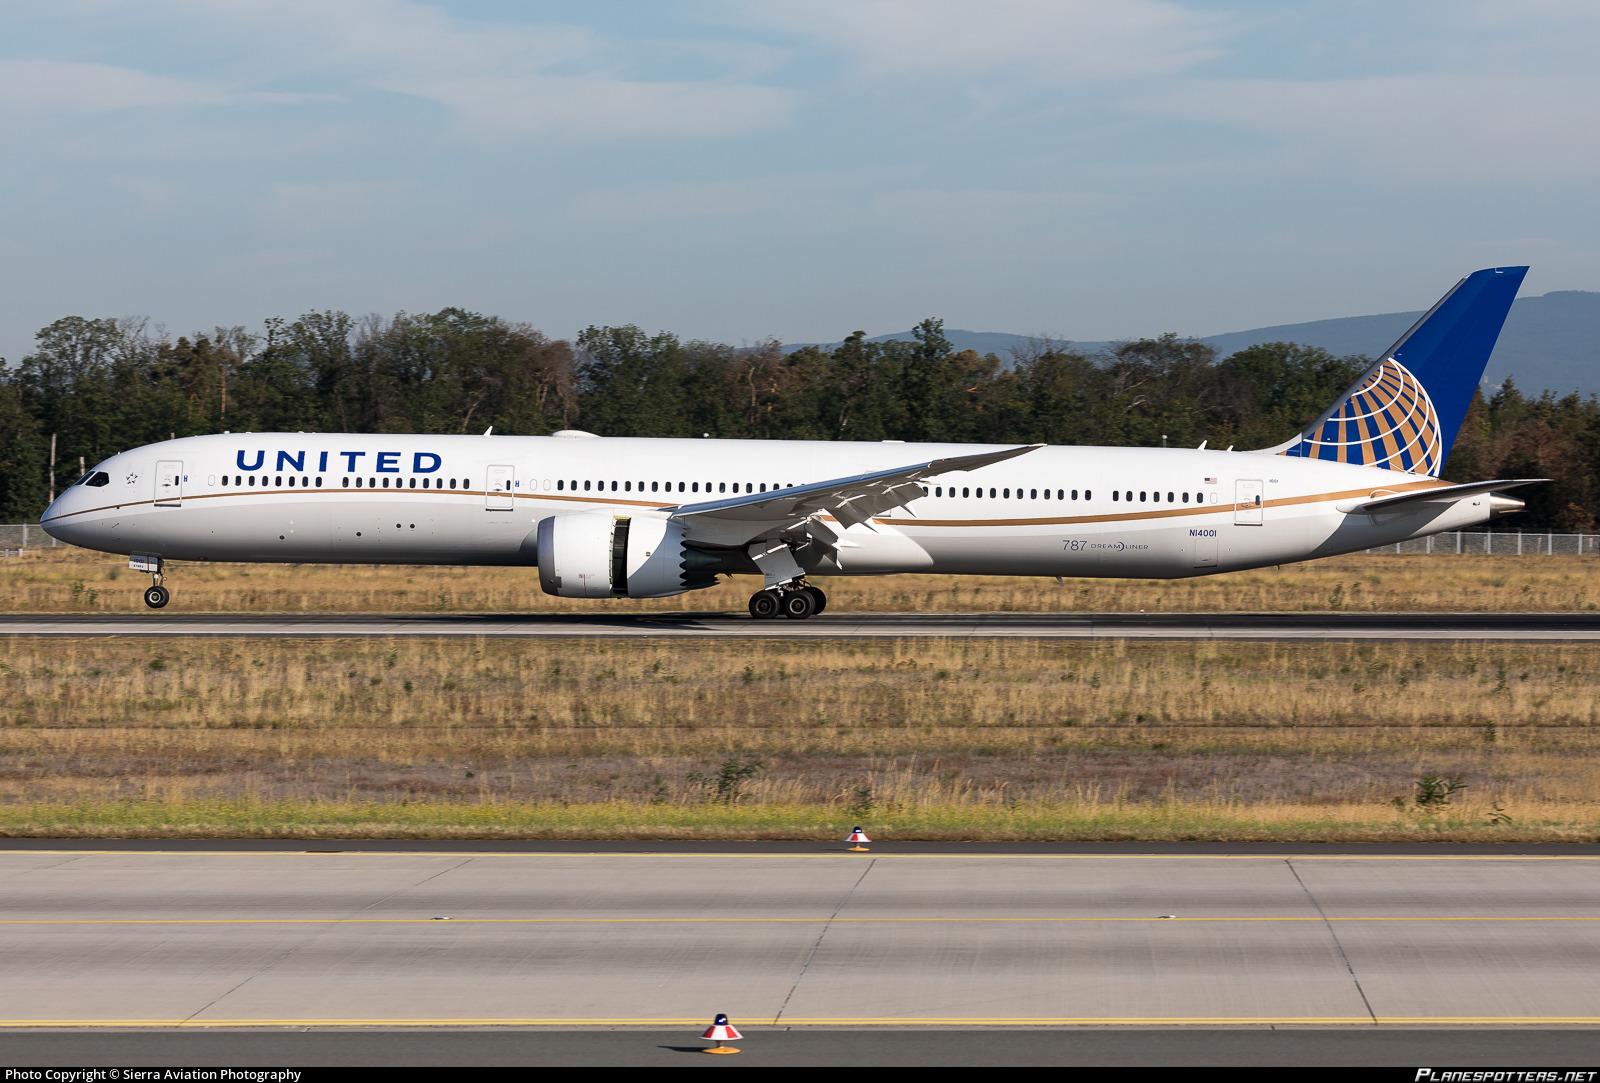 N14001 United Airlines Boeing 787-10 Dreamliner Photo by